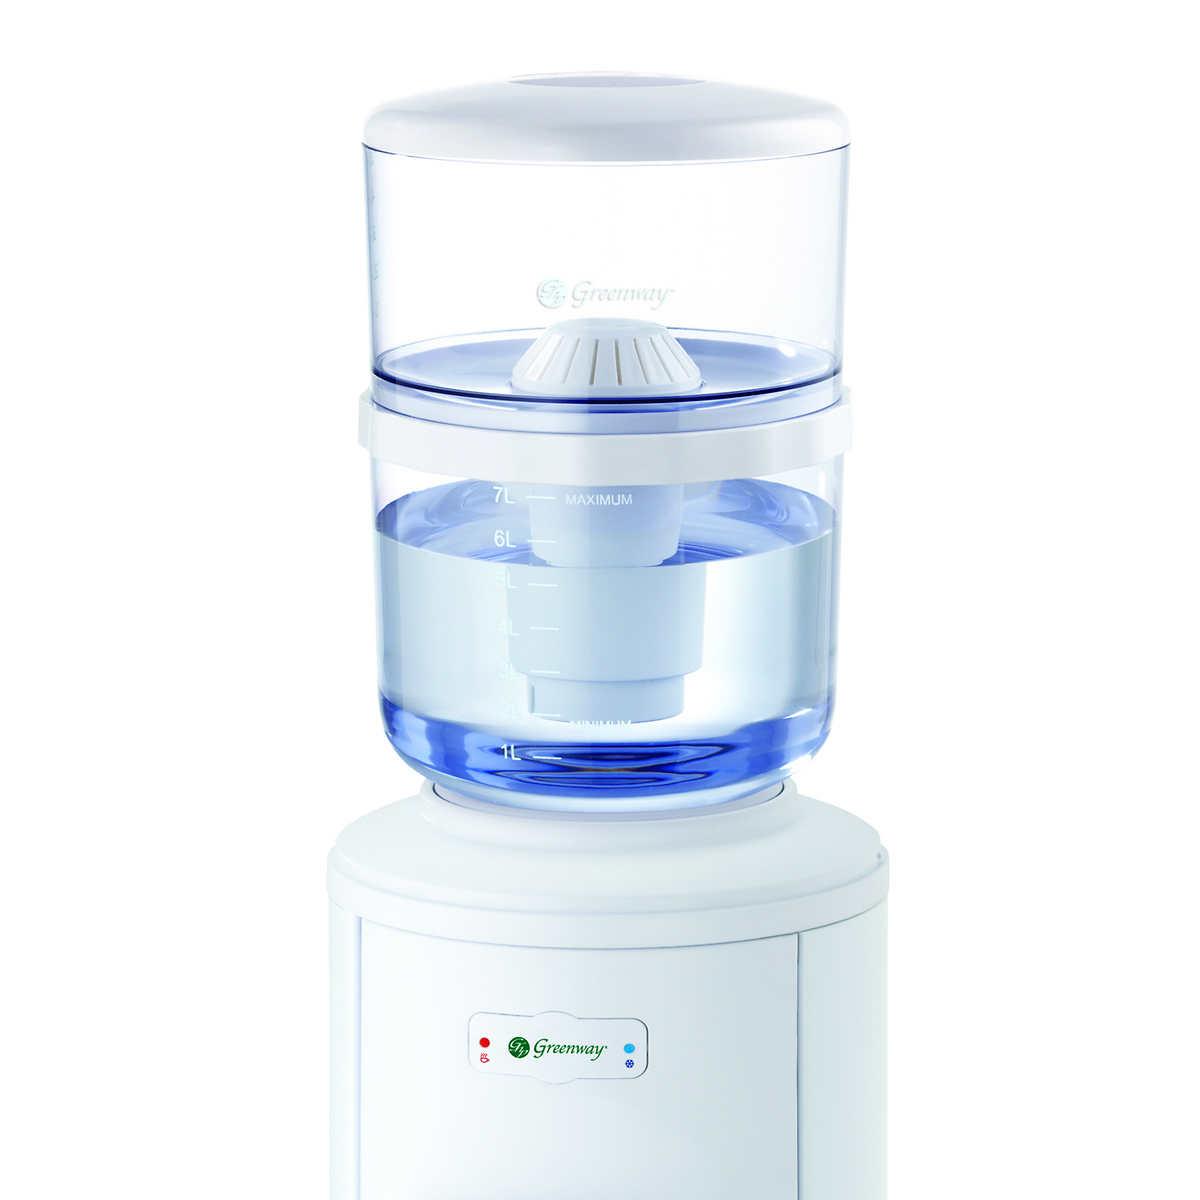 Water Filtration Dispenser Greenwayar Filtration System For Water Dispensers